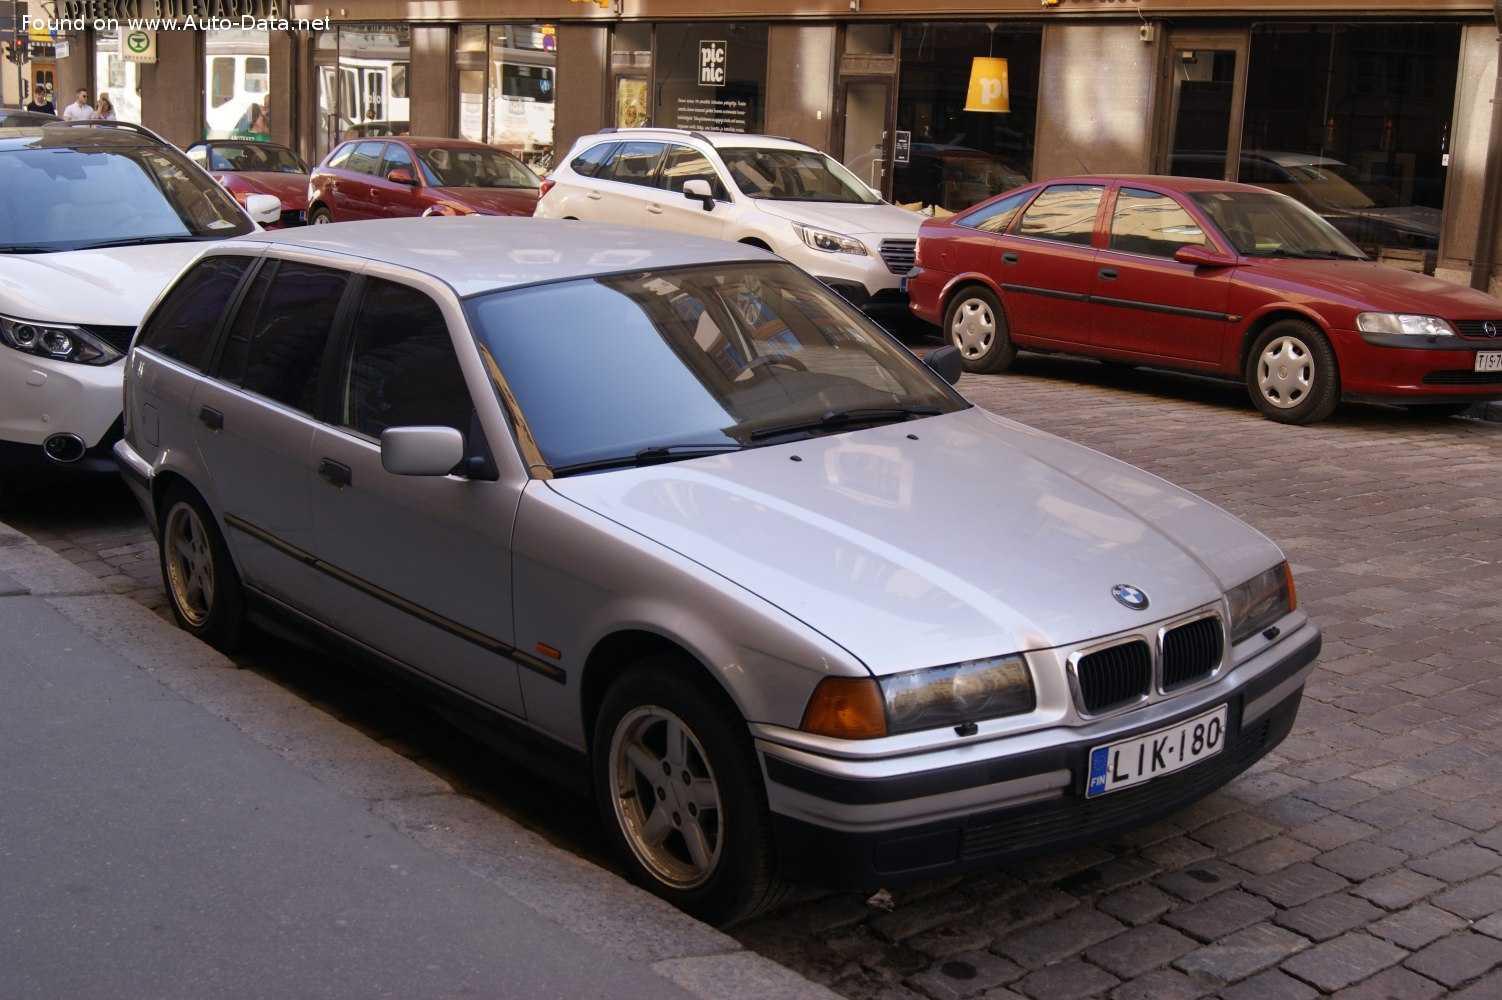 1993 BMW 3 Серии Touring (E36) 325 tds (143 лс)   Технические характеристики, расход топлива , Габариты